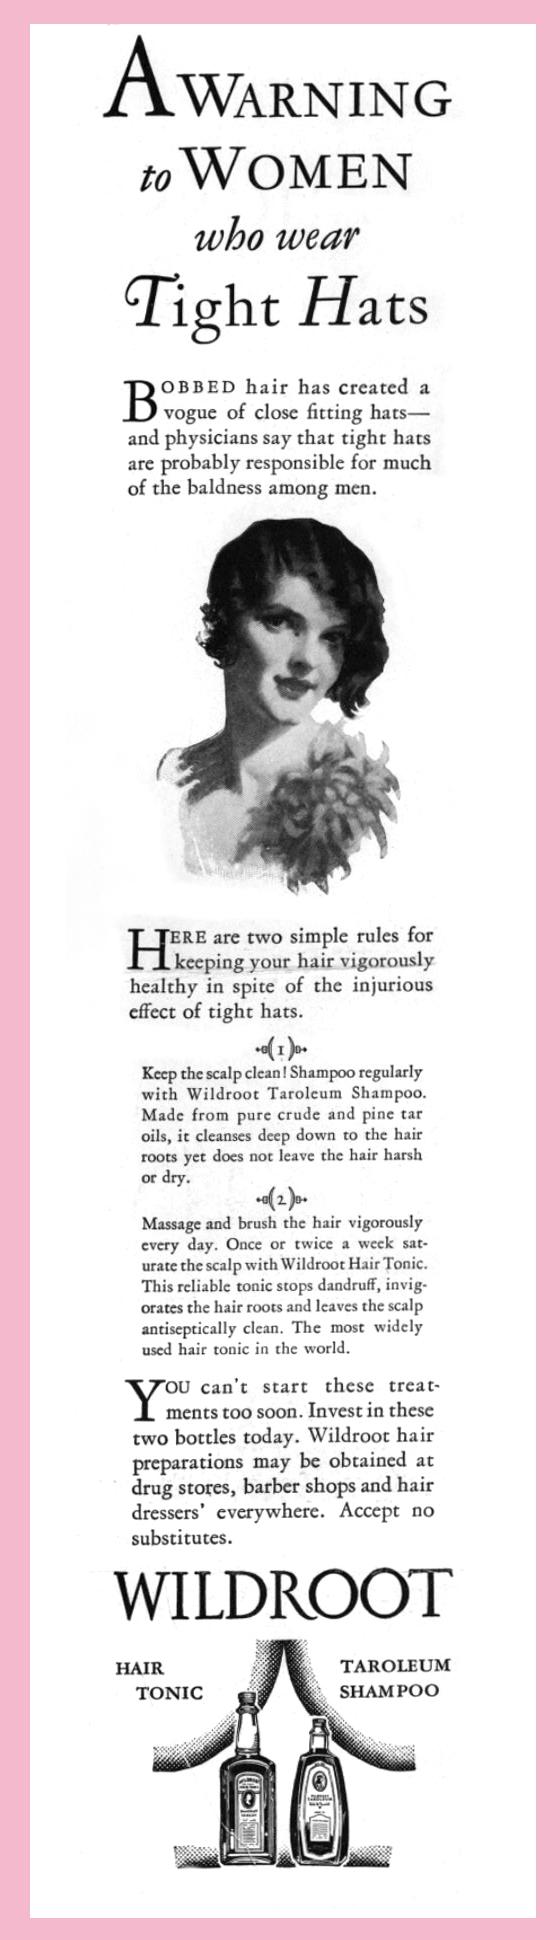 Wildroot hair tonic advertisement 1920s